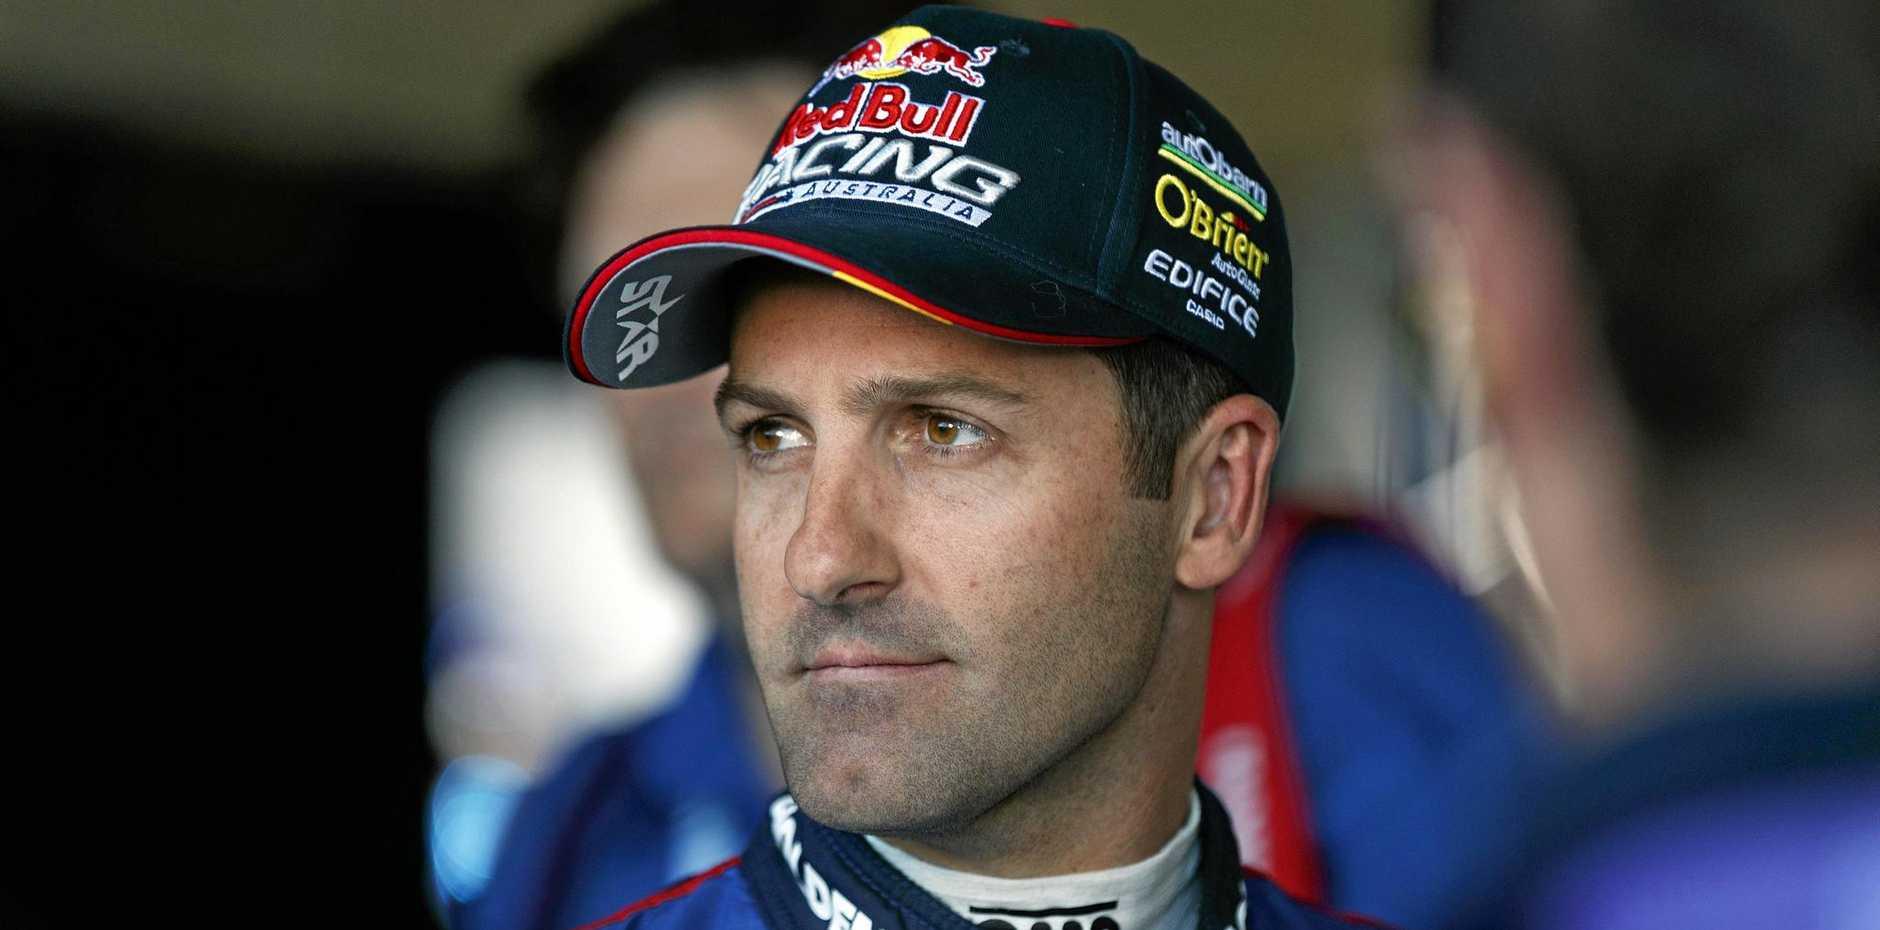 Red Bull Racing Australia driver Jamie Whincup.